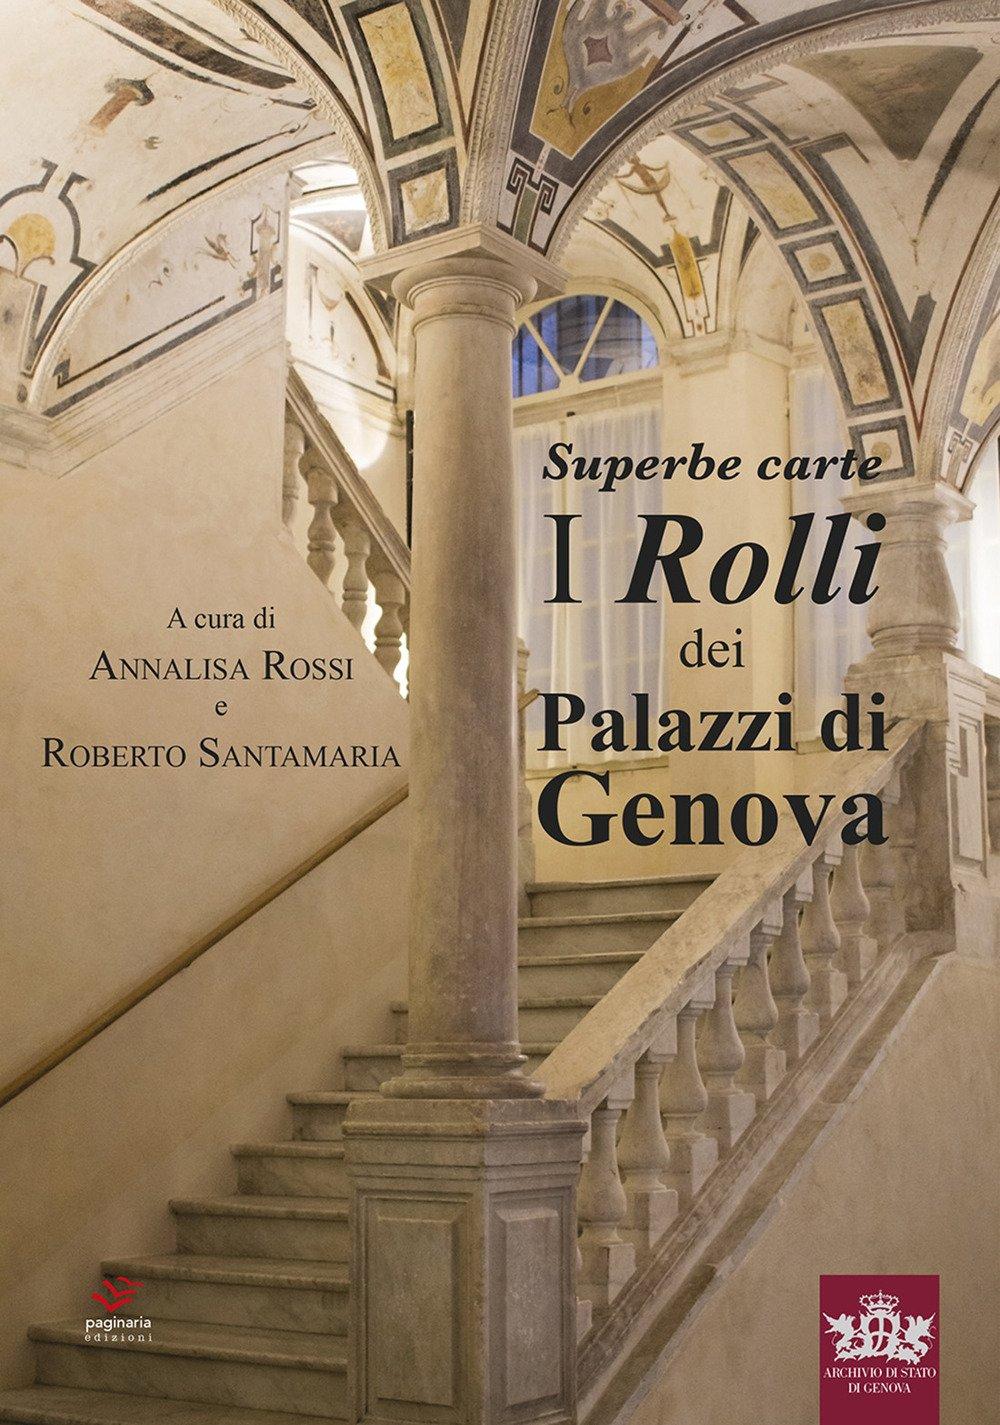 Superbe carte. I Rolli dei Palazzi di Genova. Ediz. illustrata Copertina rigida – 31 dic 2018 A. Rossi R. Santamaria Paginaria 889427215X